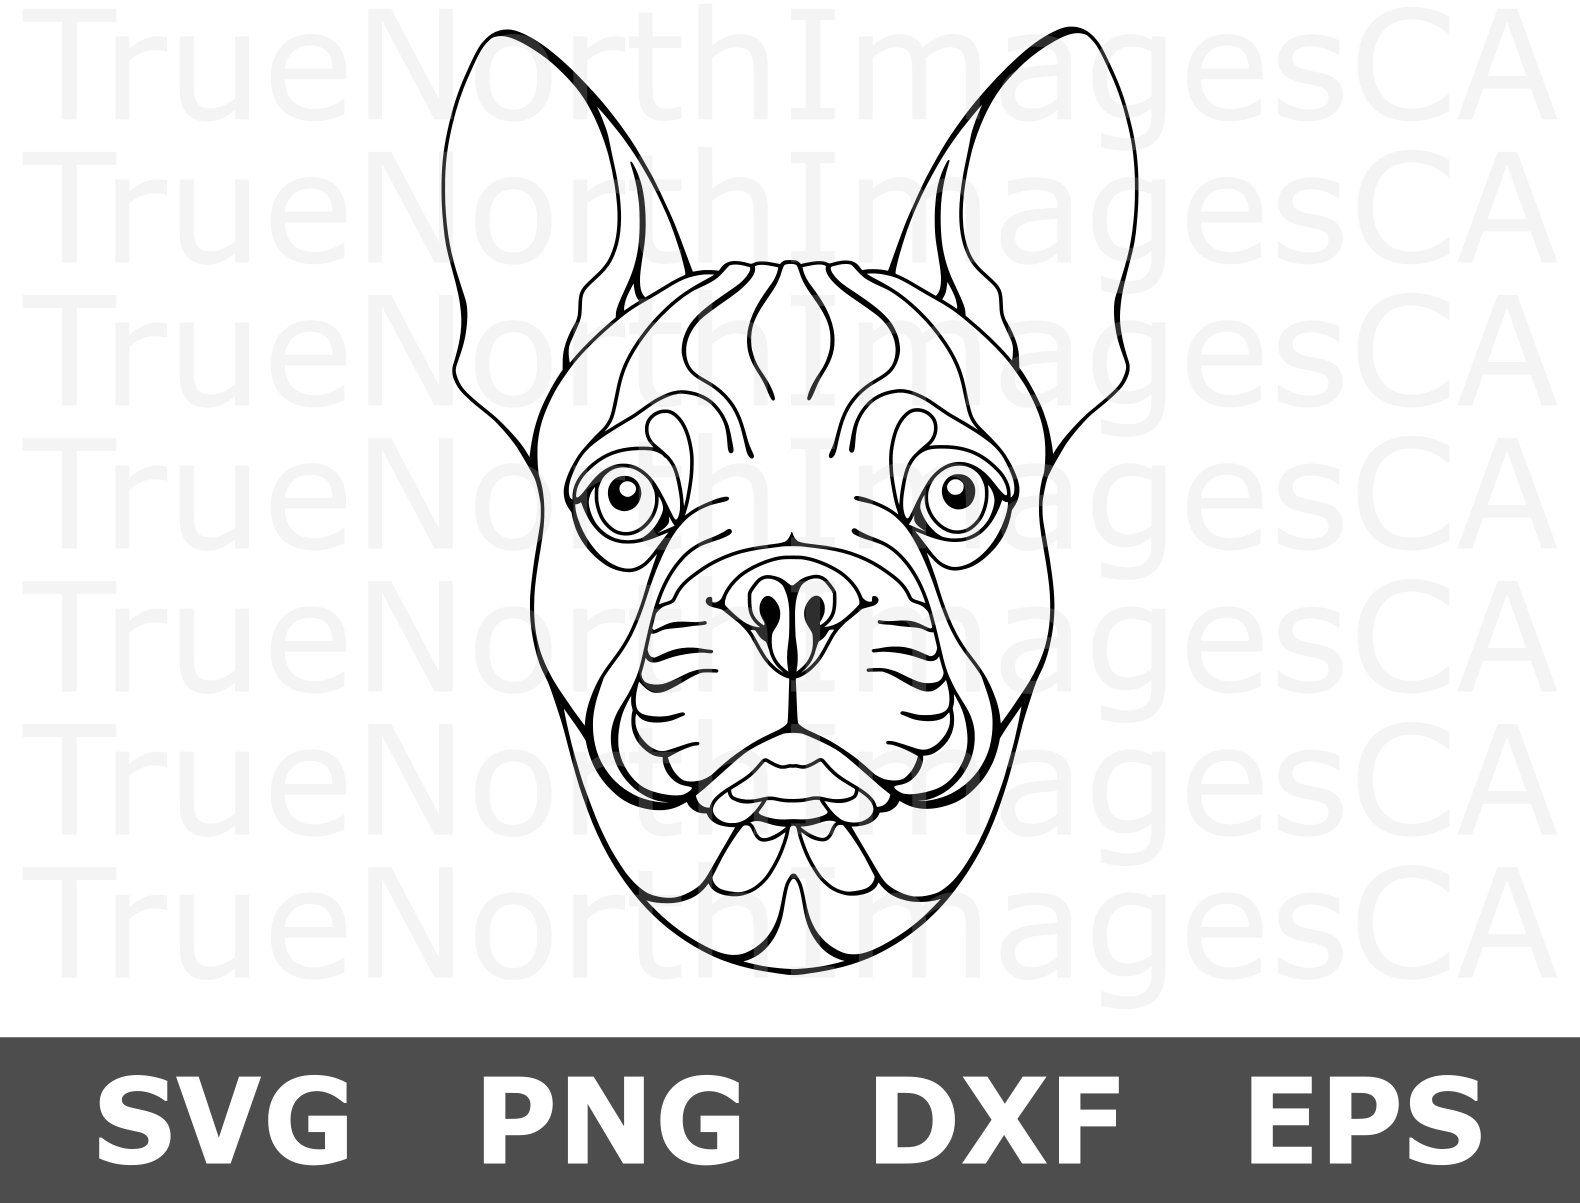 Dog Svg Bulldog Svg French Bulldog Svg Dog Silhouette Dog Stencil Svg Svg Files For Cricut Silhouette Files Dog Stencil Valentines Svg Valentines Shirt